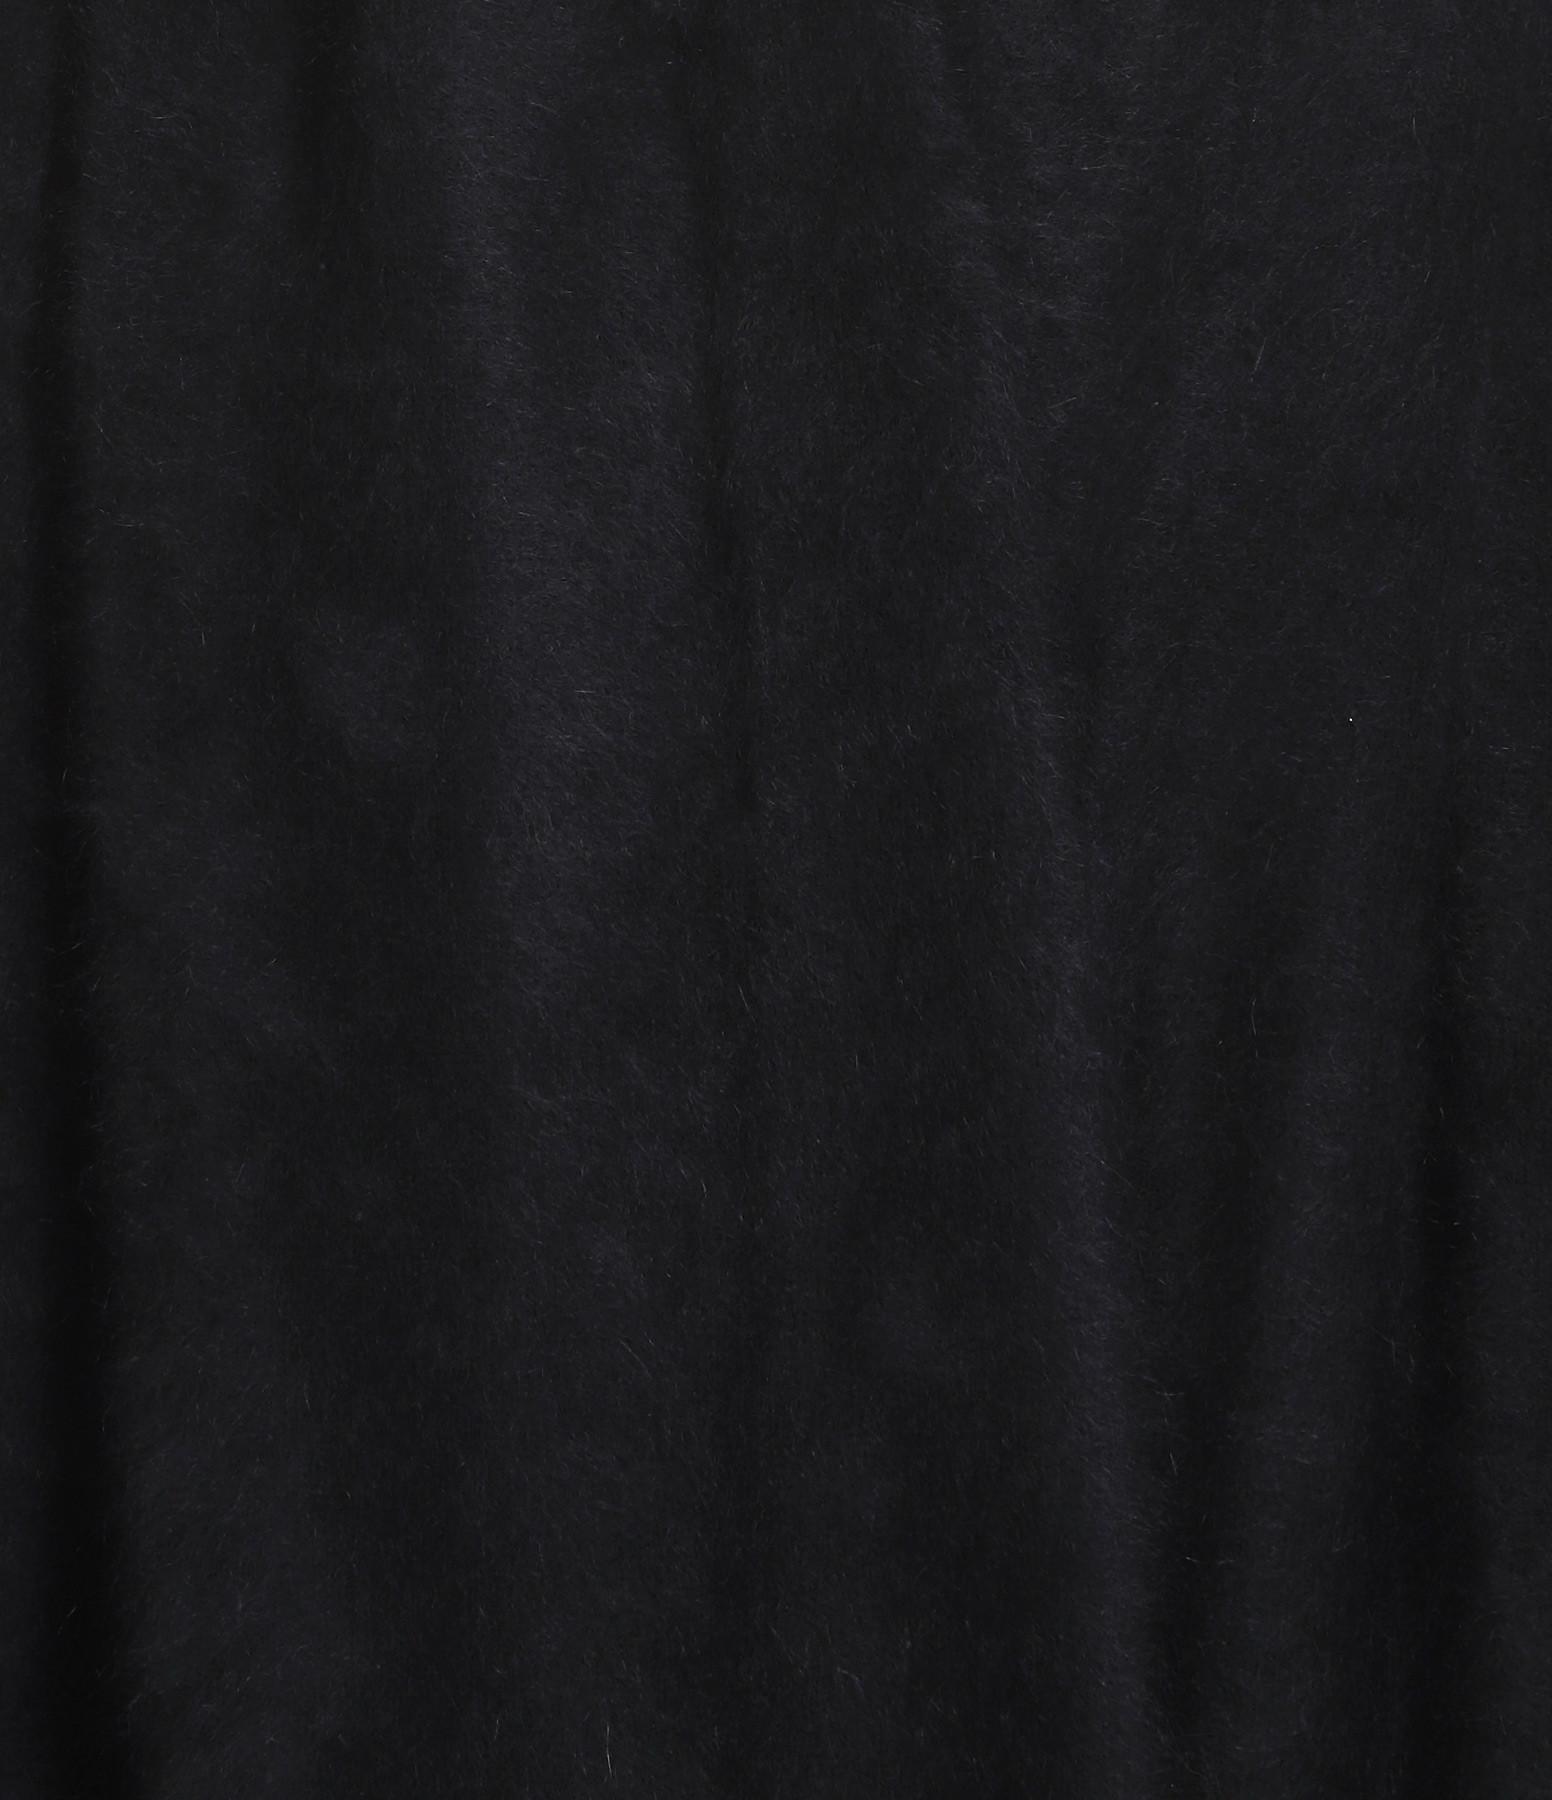 CT PLAGE - Gilet Long Raccoon Noir